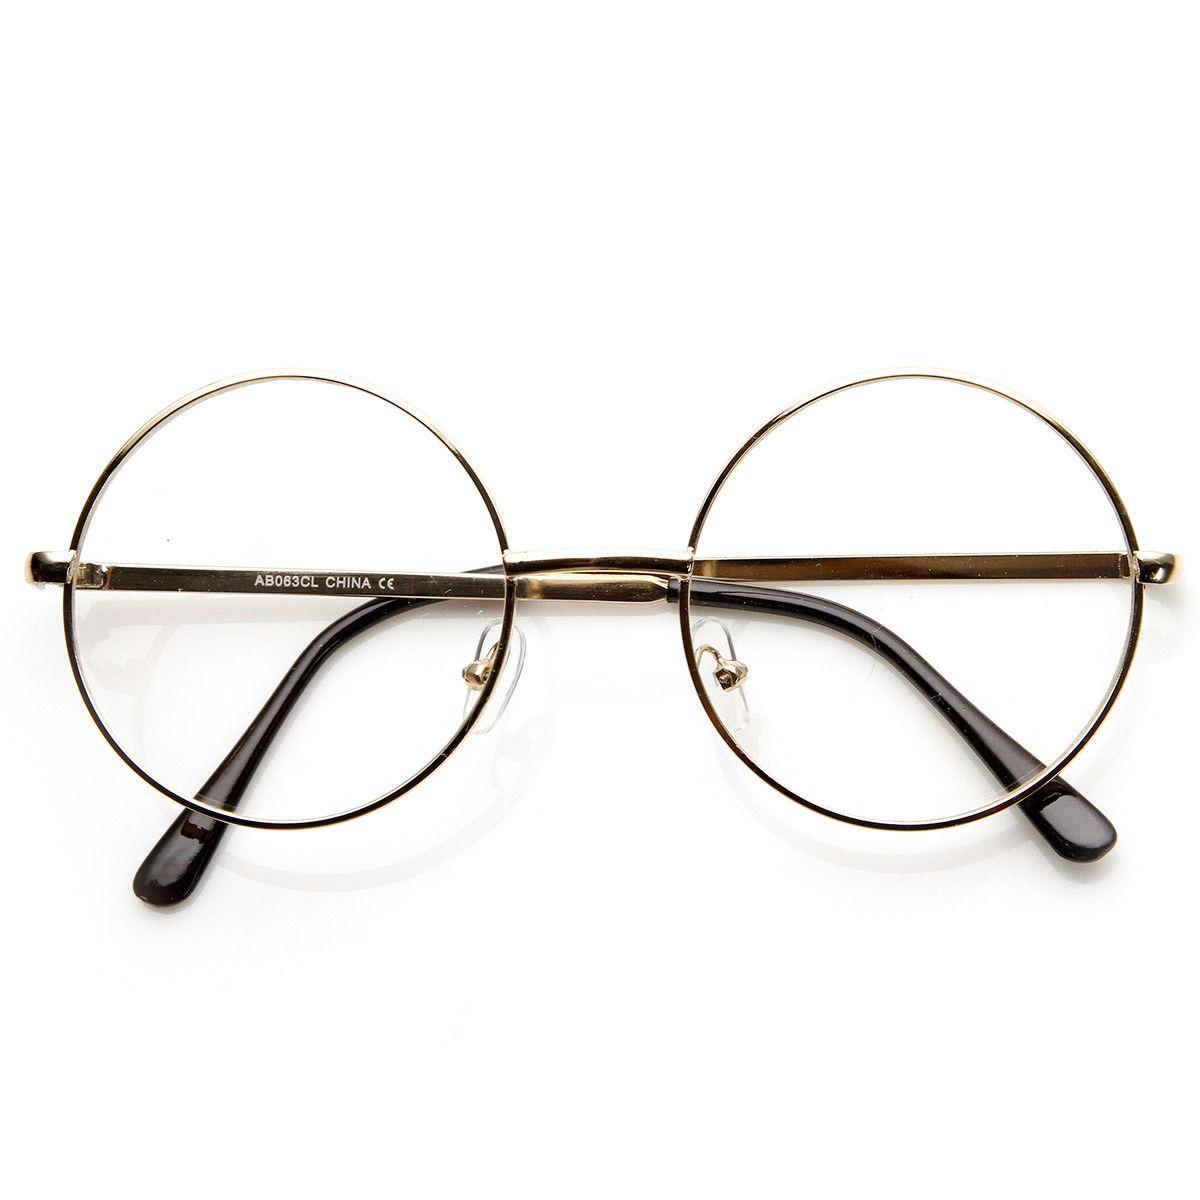 76671162ea Lennon Mid Size Full Metal Frame Clear Lens Round Glasses - sunglass.la - 1